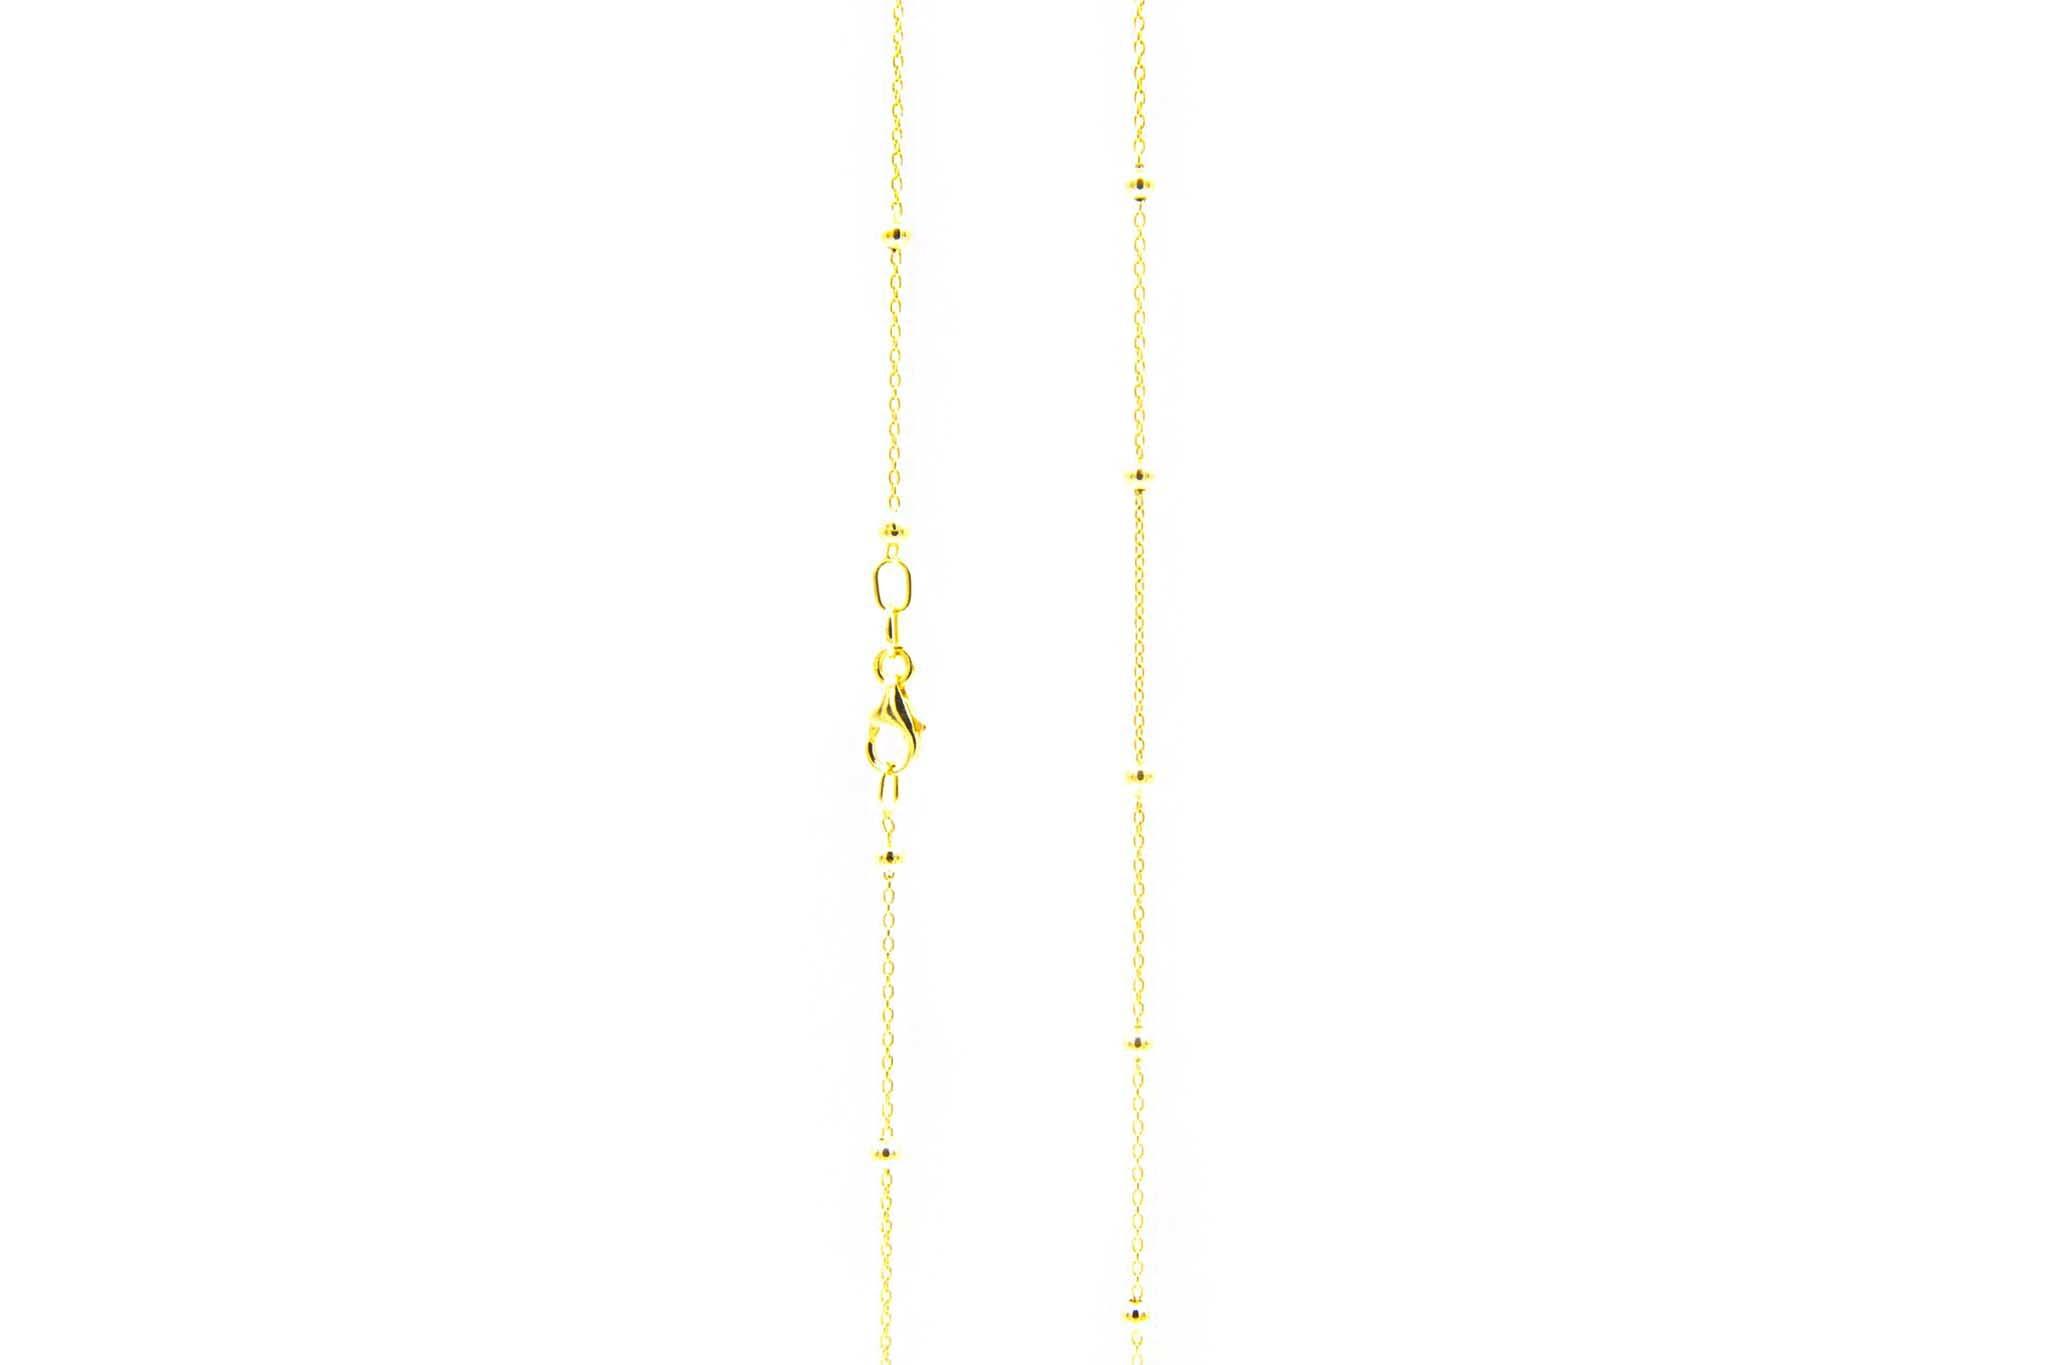 Ketting subtiele chain met balletjes-4